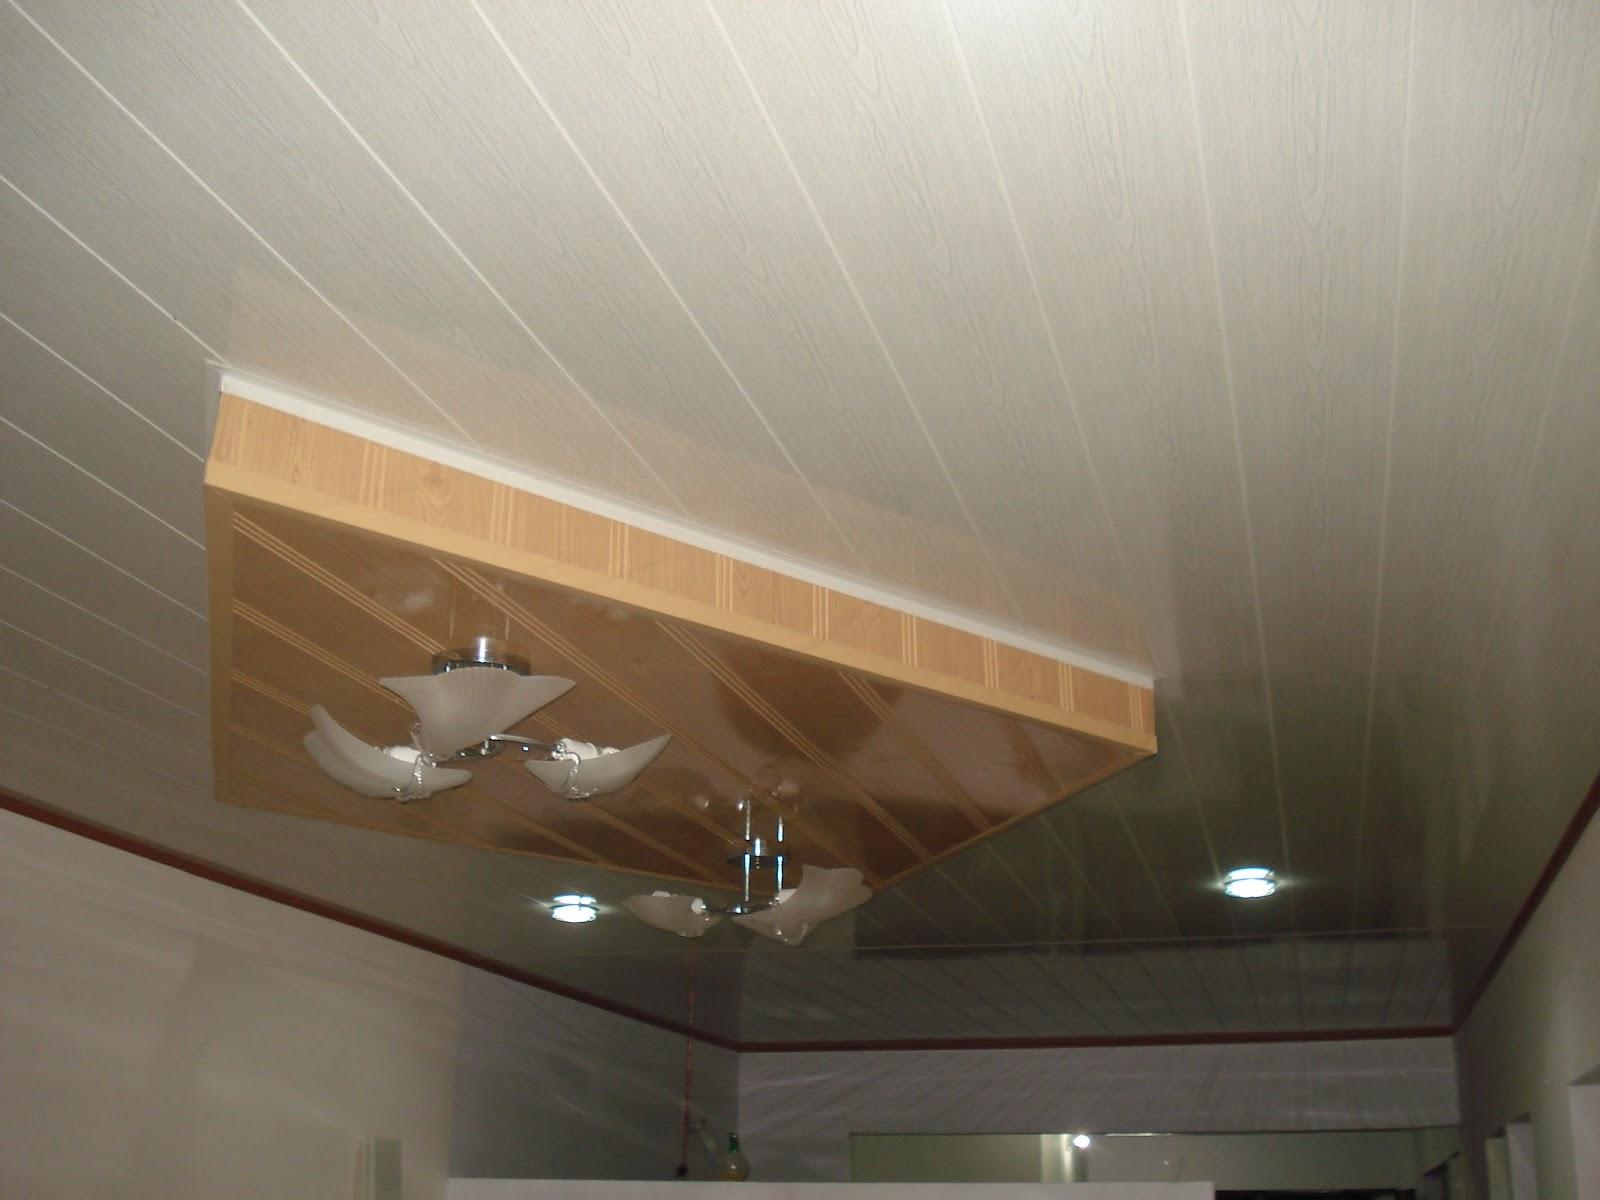 Wilson leon dise os arquitectonicos para sus espacios for Techos de drywall para cocinas